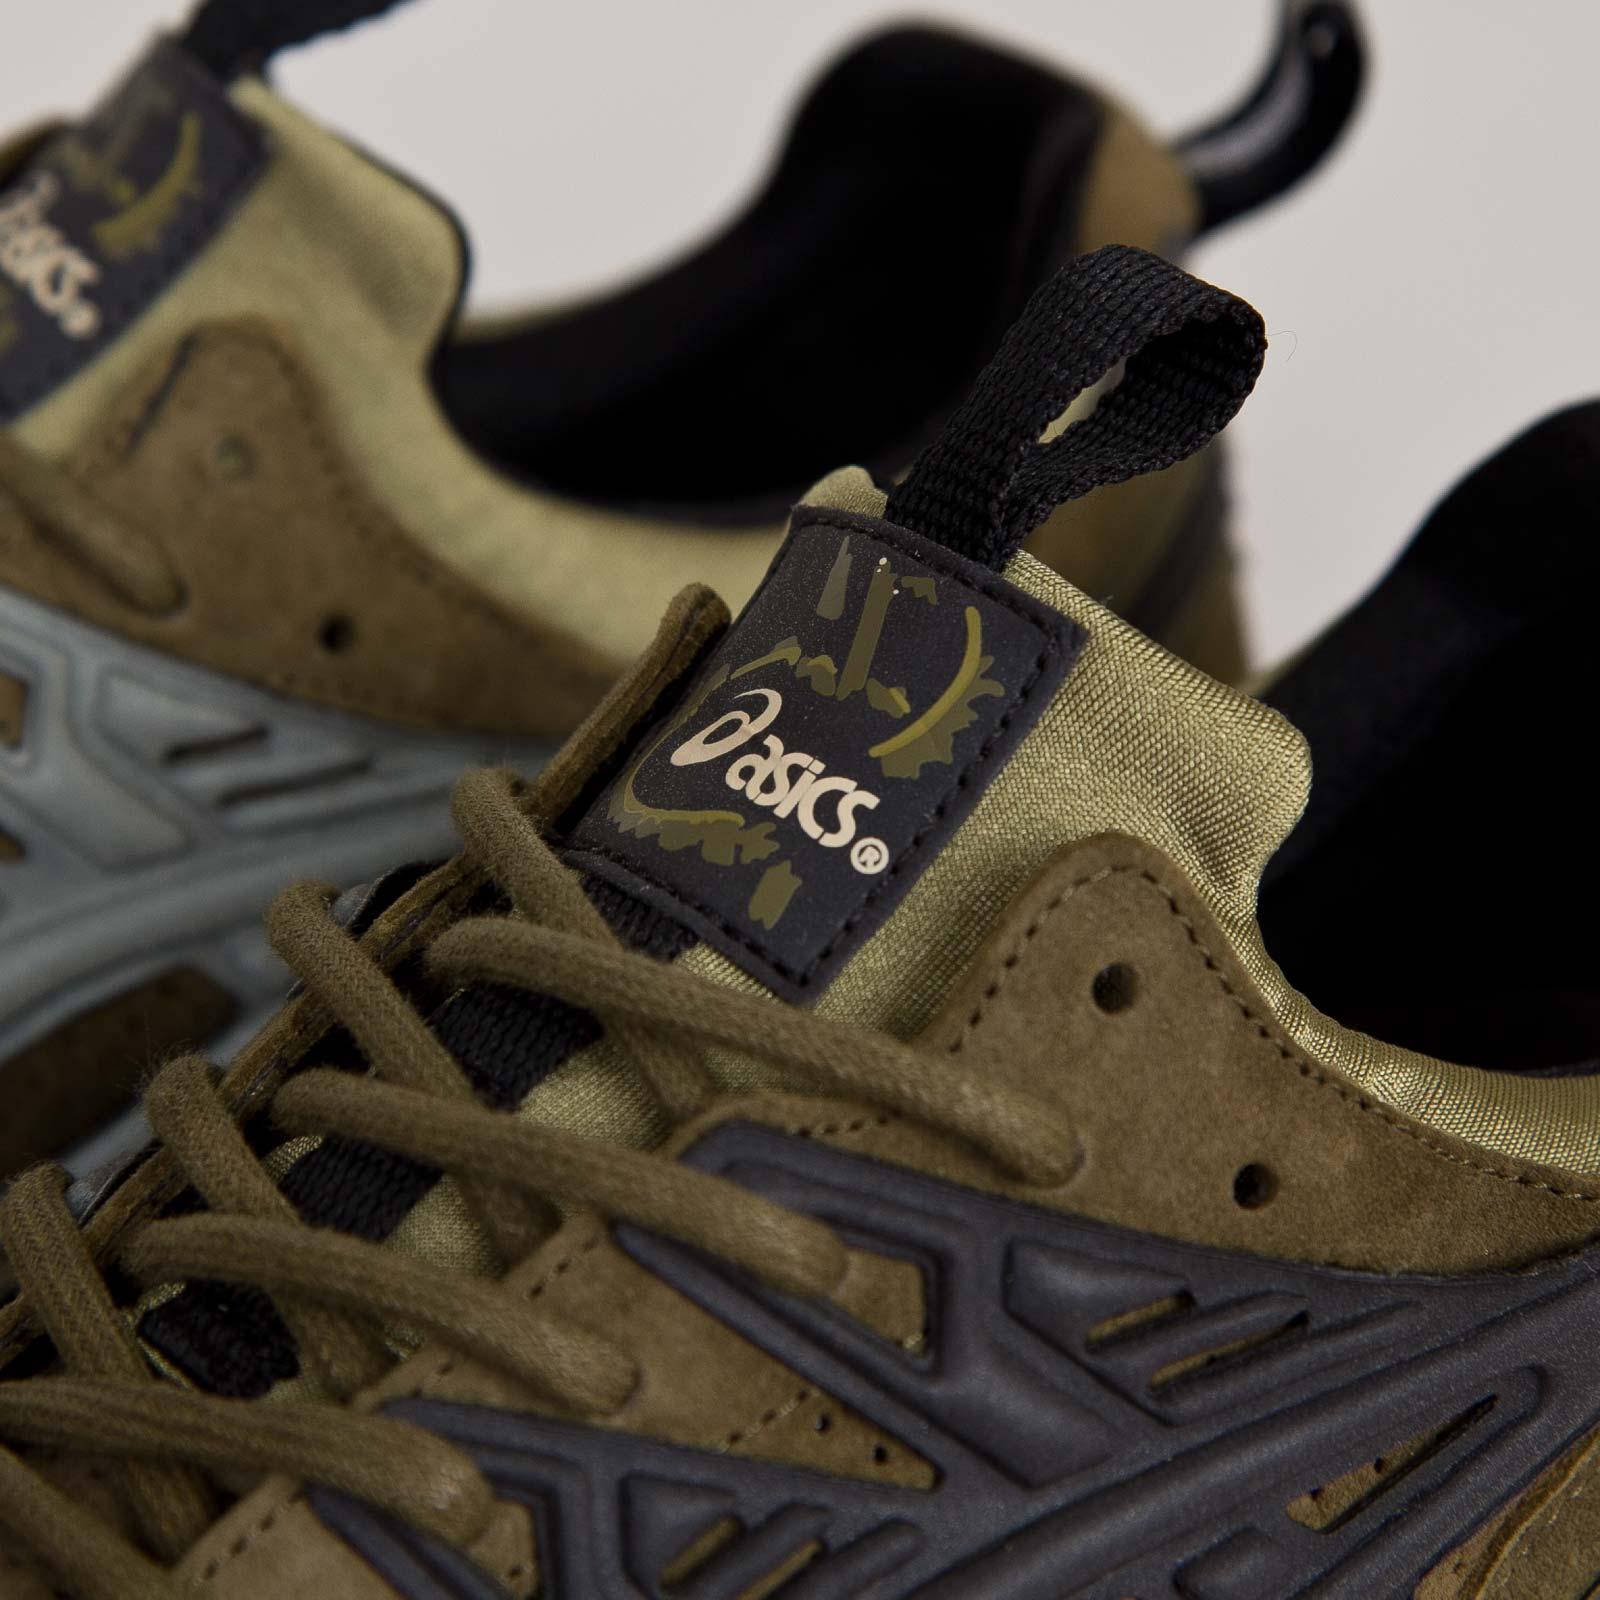 on sale 95c81 e5925 ASICS Tiger Gel-Kayano Trainer - H42uk-8690 - Sneakersnstuff ...